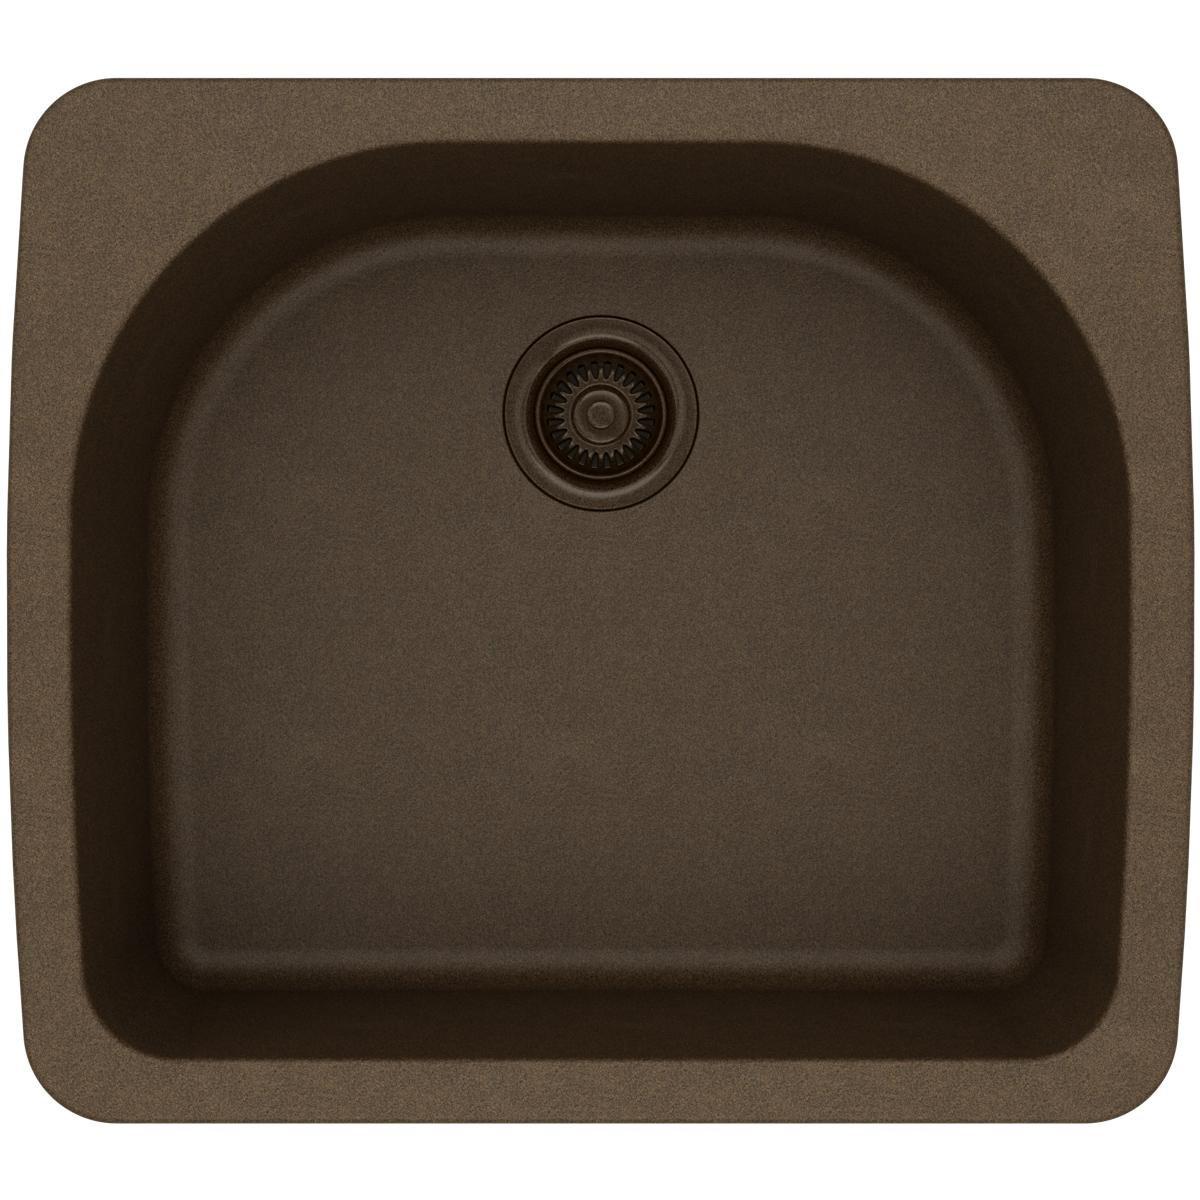 Elkay Quartz Classic ELGS2522MC0 Mocha Single Bowl Top Mount Sink